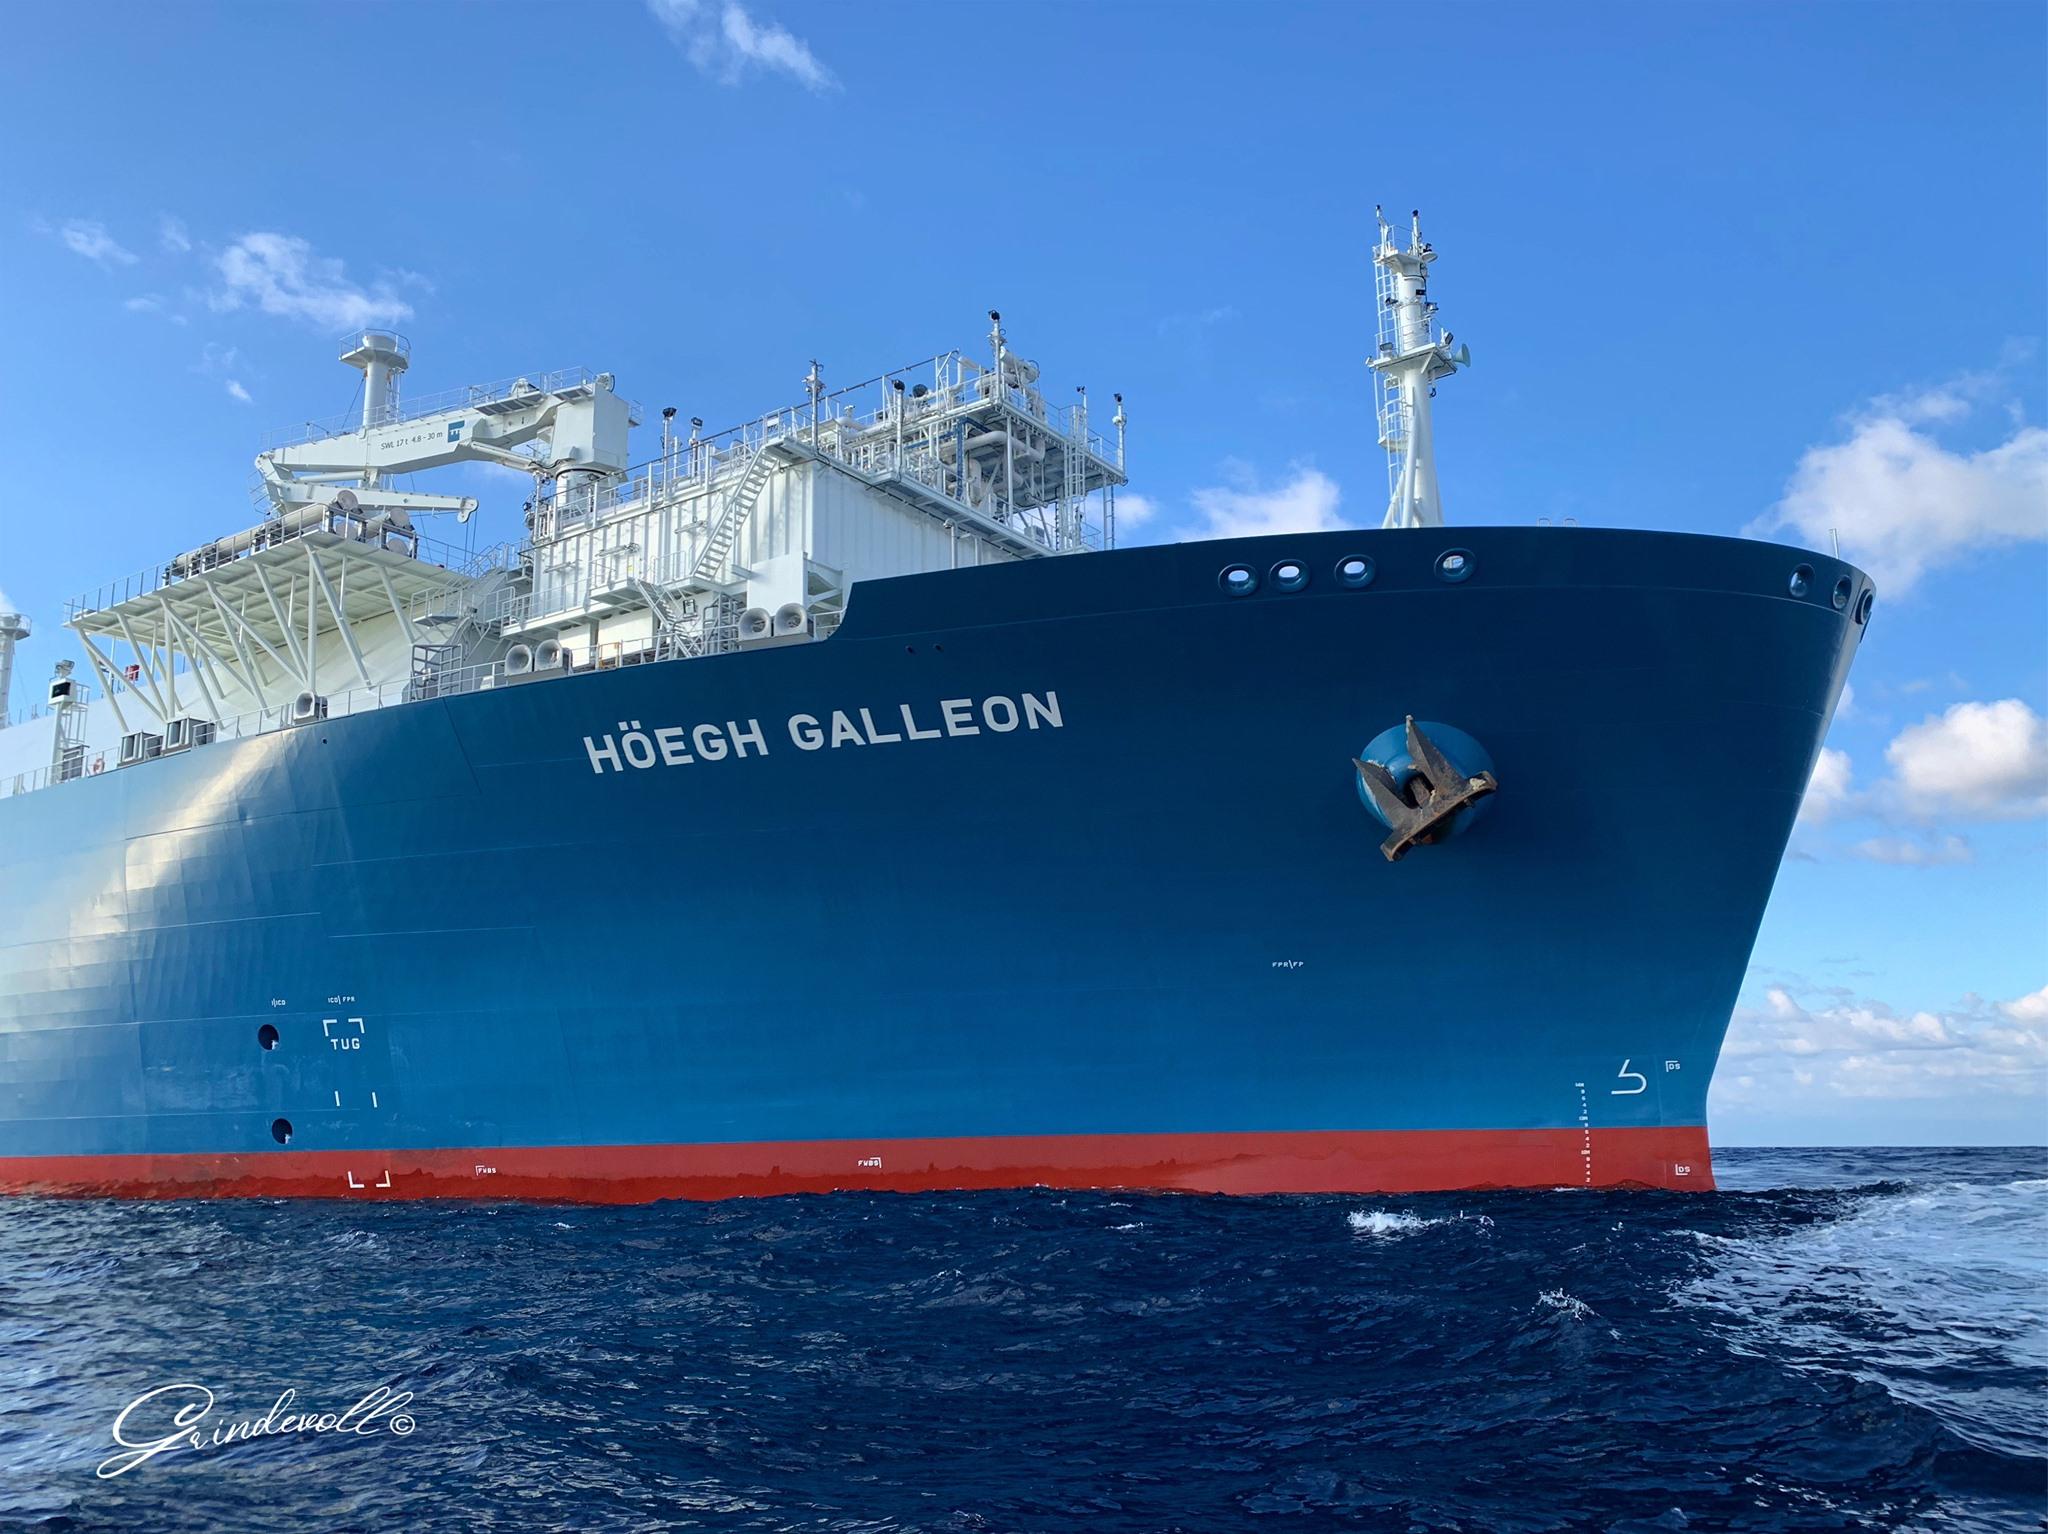 Tunable and Höegh LNG test gas analyser onboard FSRU Höegh Galleon